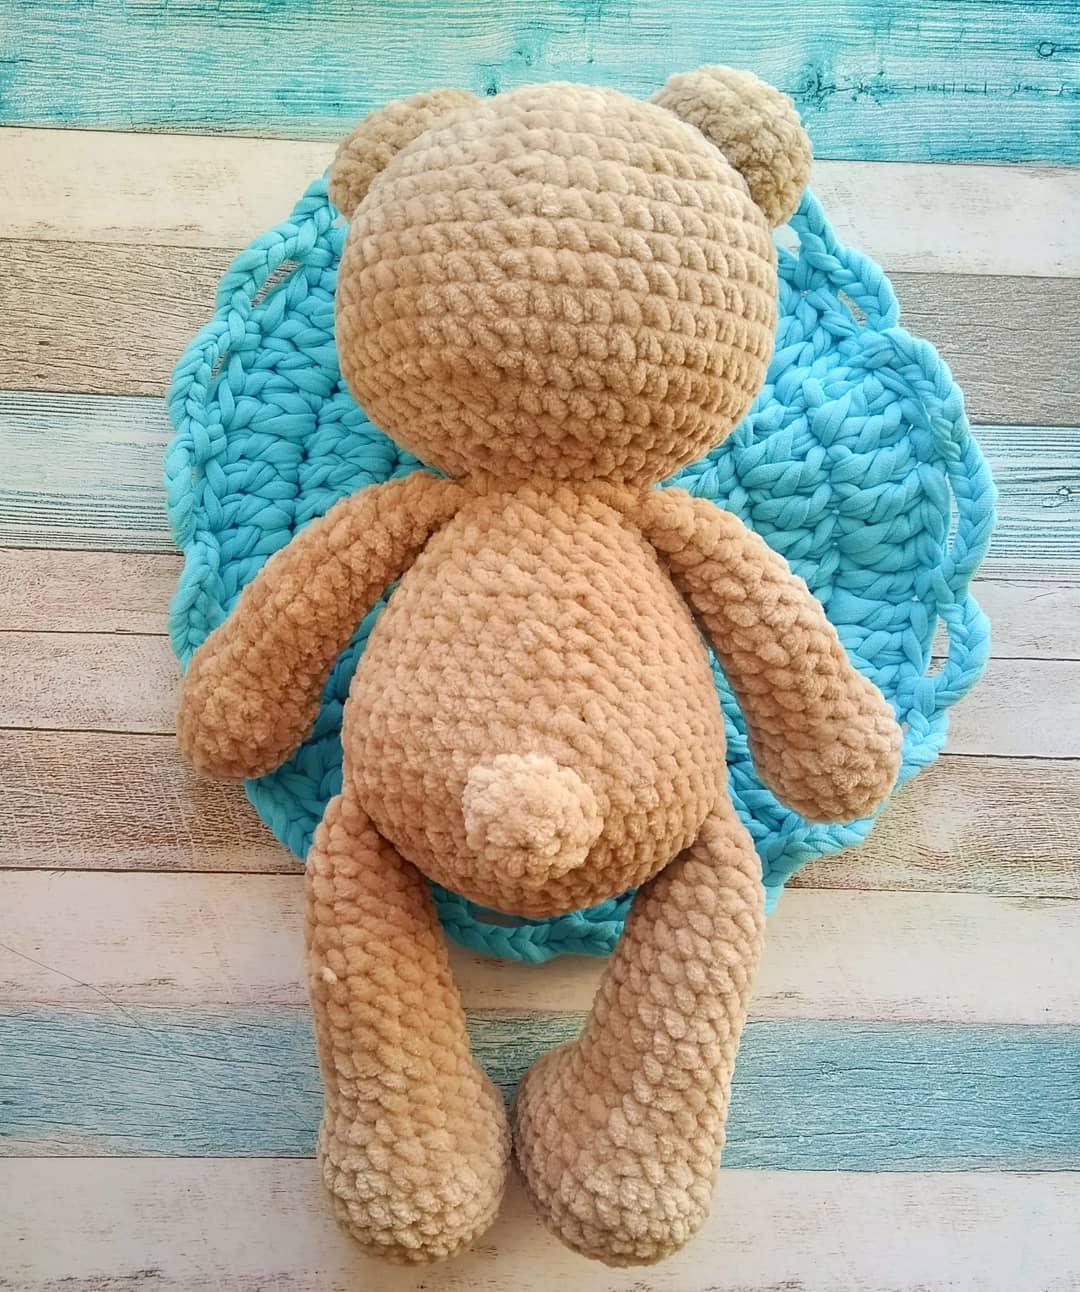 61 Mini Crochet Animals [Free Patterns] | AllFreeCrochet.com | 1292x1080